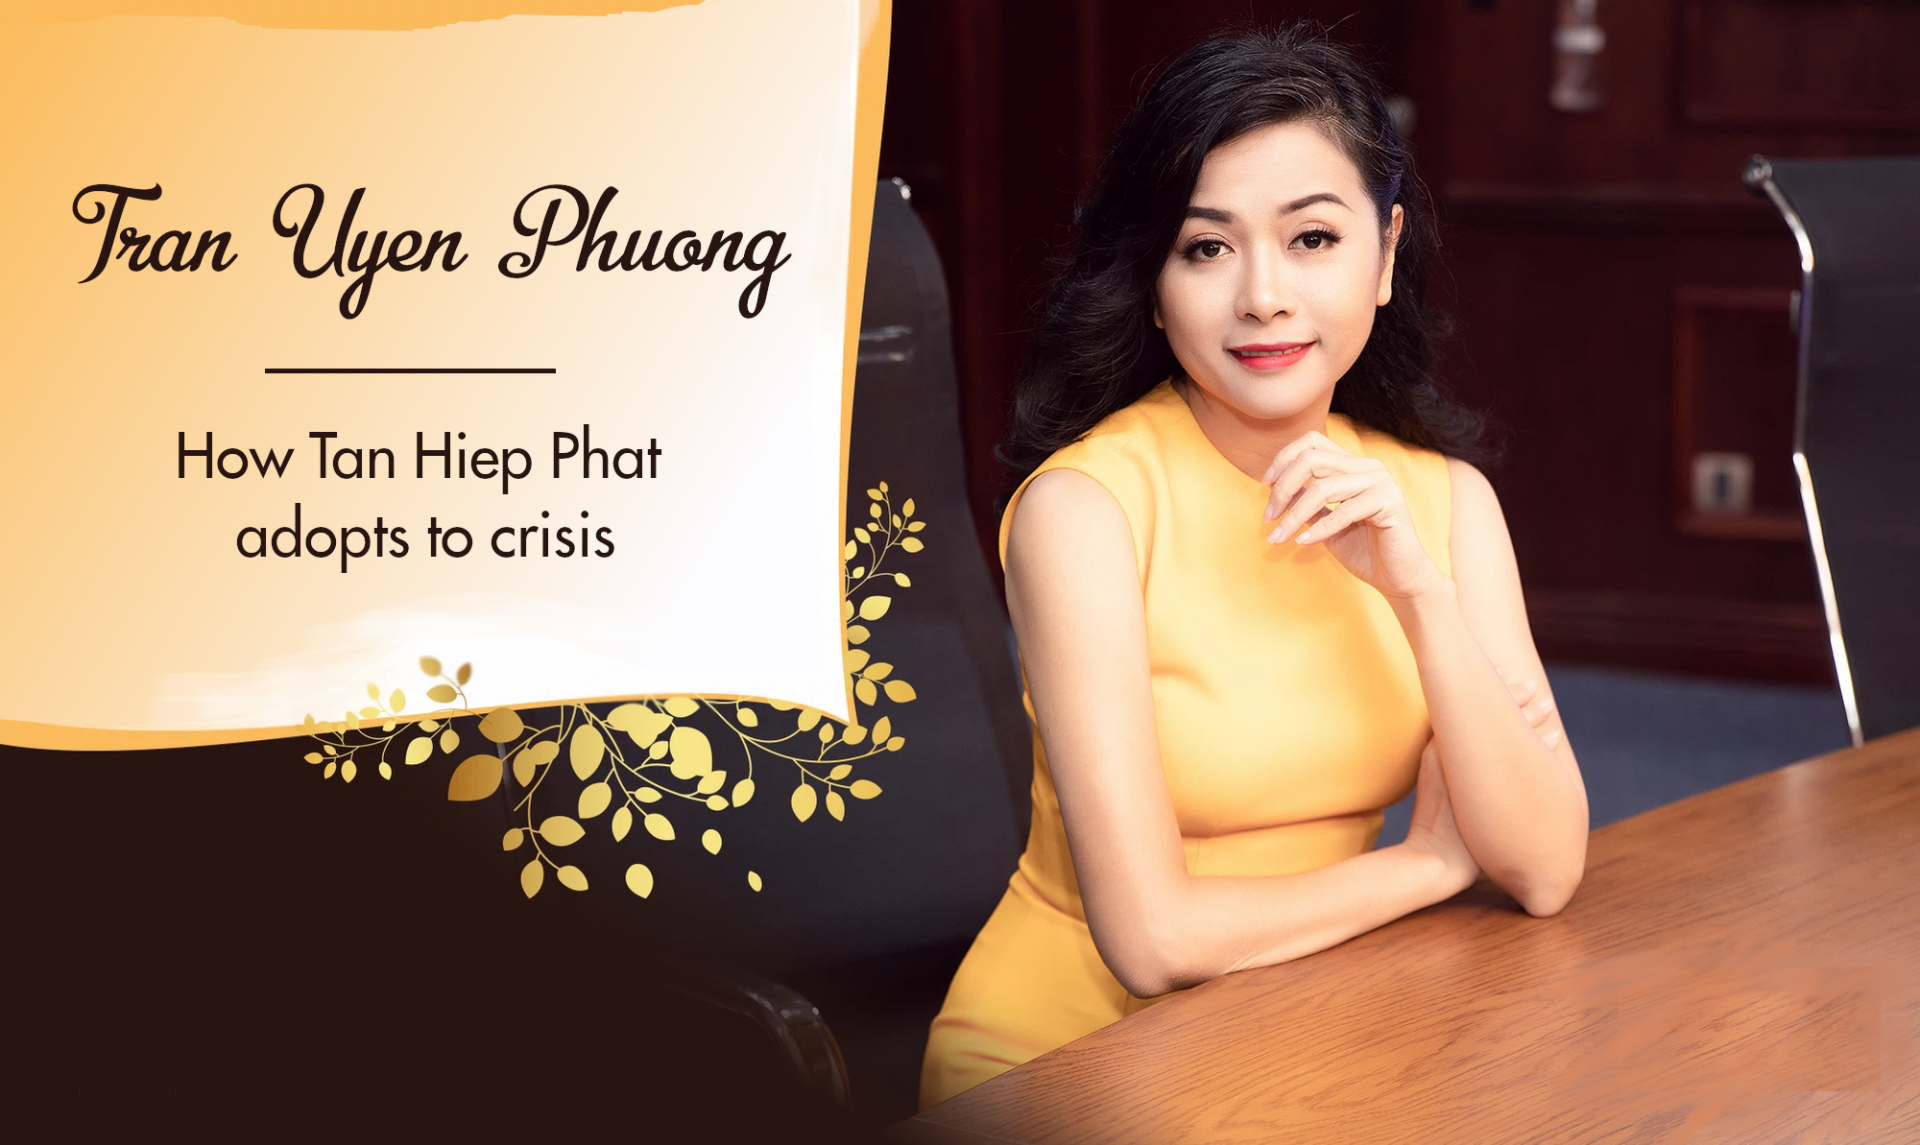 Phuong Uyen Tran: How Tan Hiep Phat Adapts to Crisis